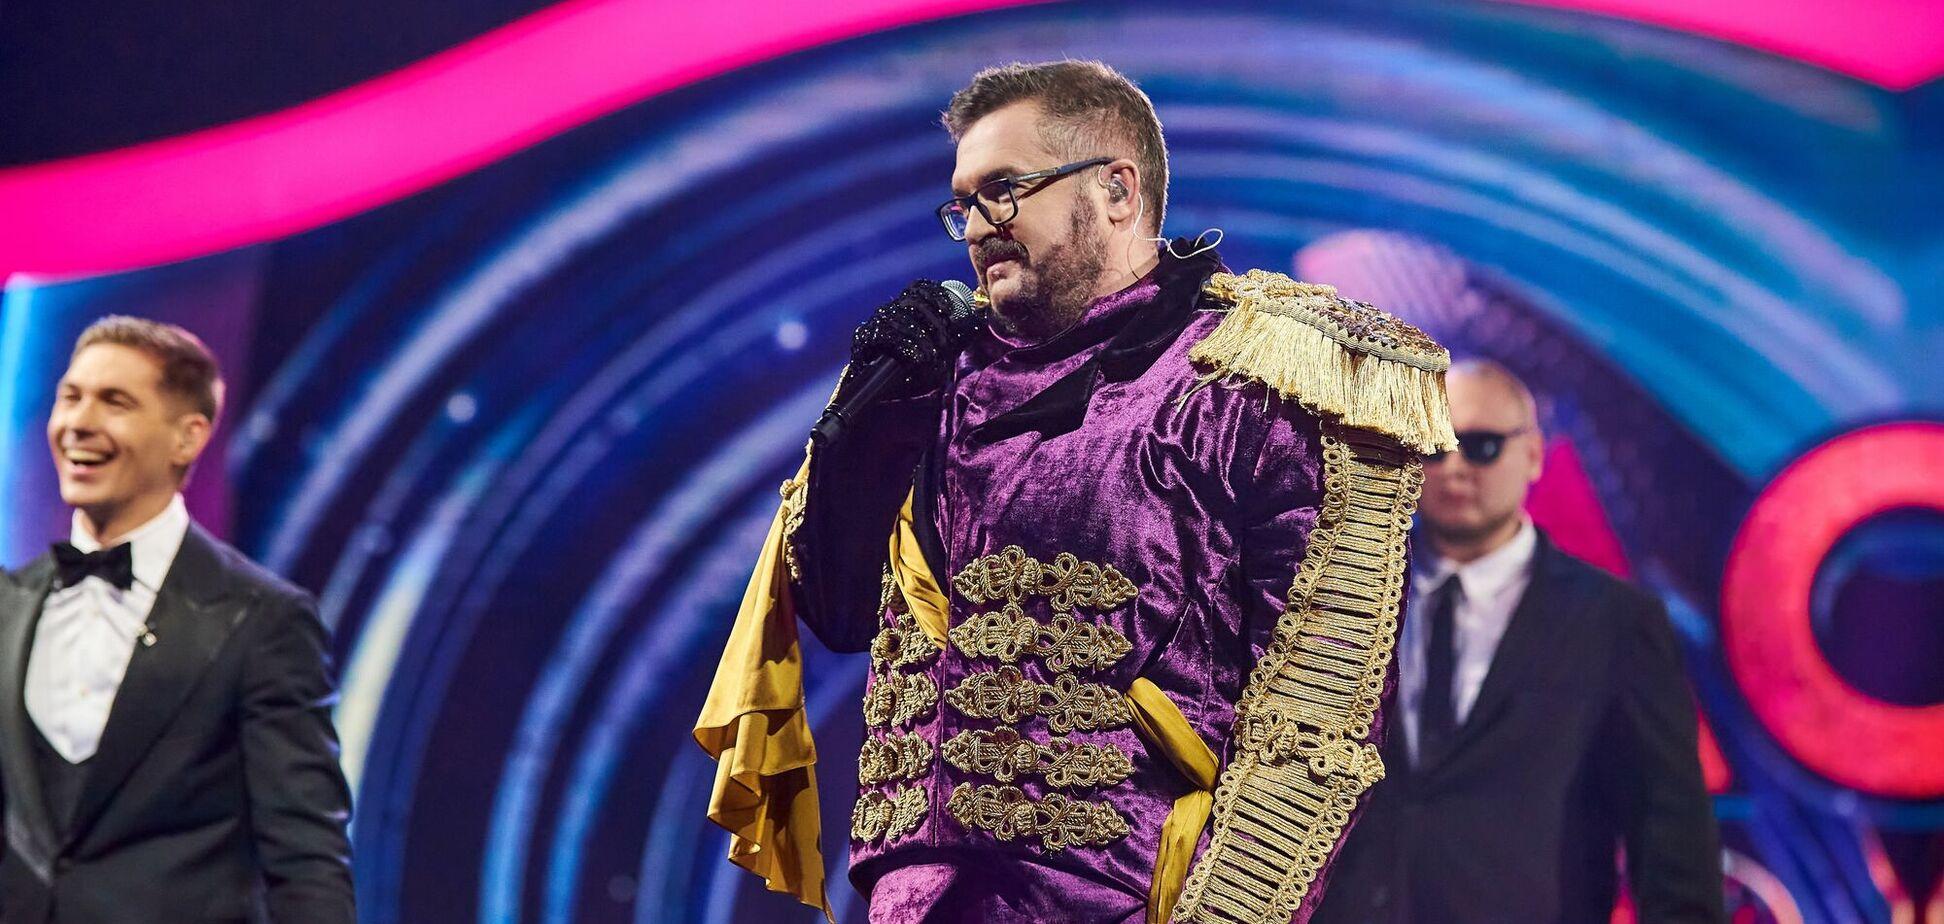 Александр Пономарев в образе Льва на шоу 'Маска'